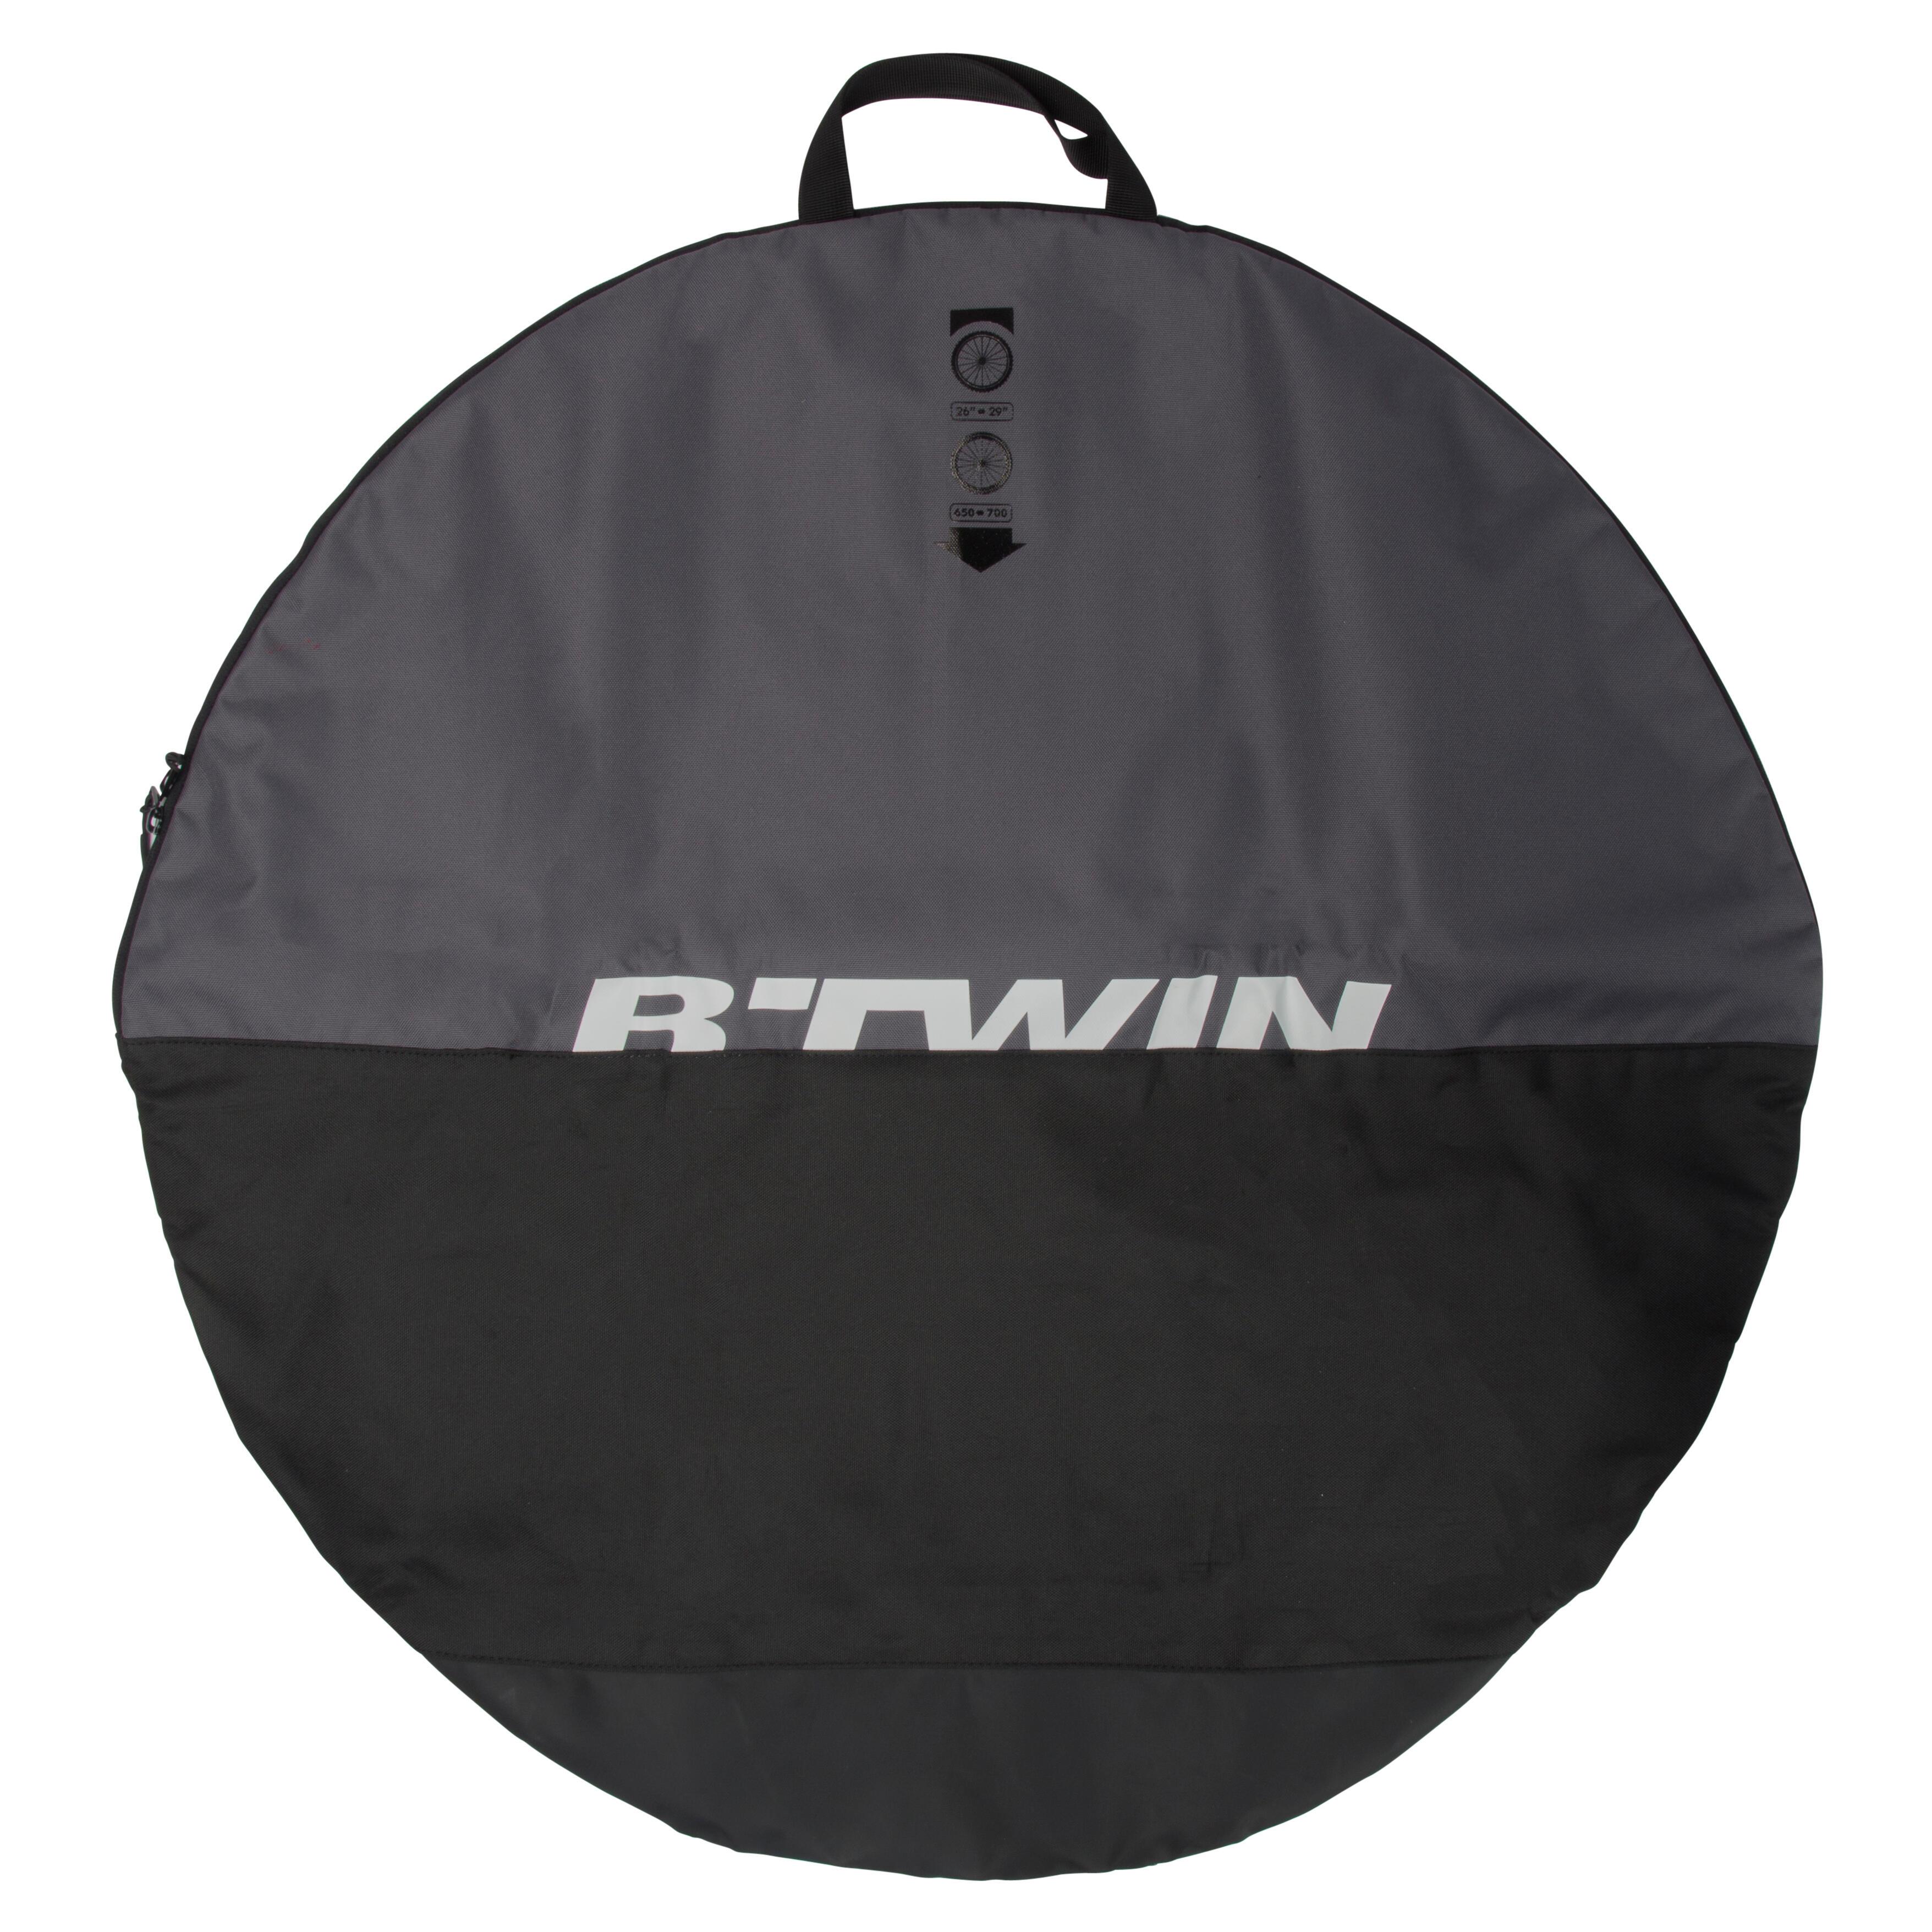 Wheel Cover - 1 Wheel